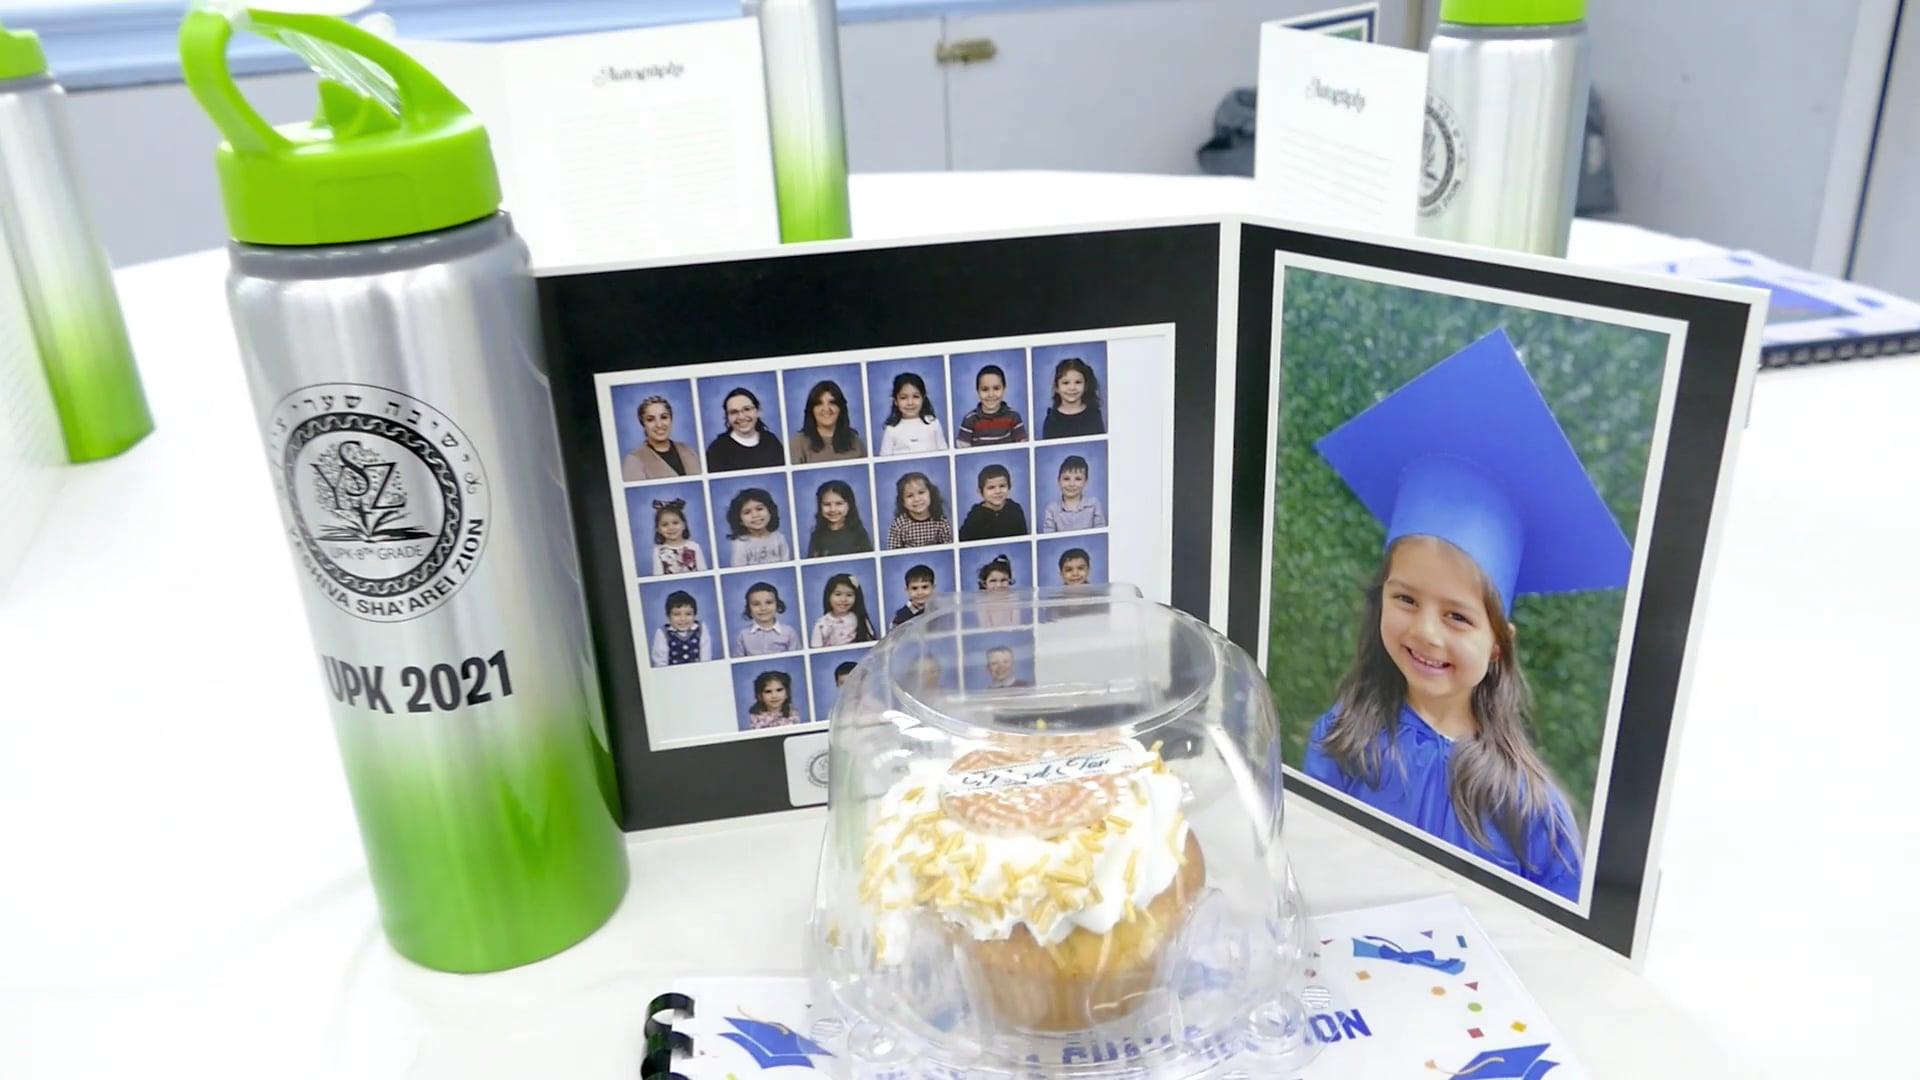 UPK Graduation 2021